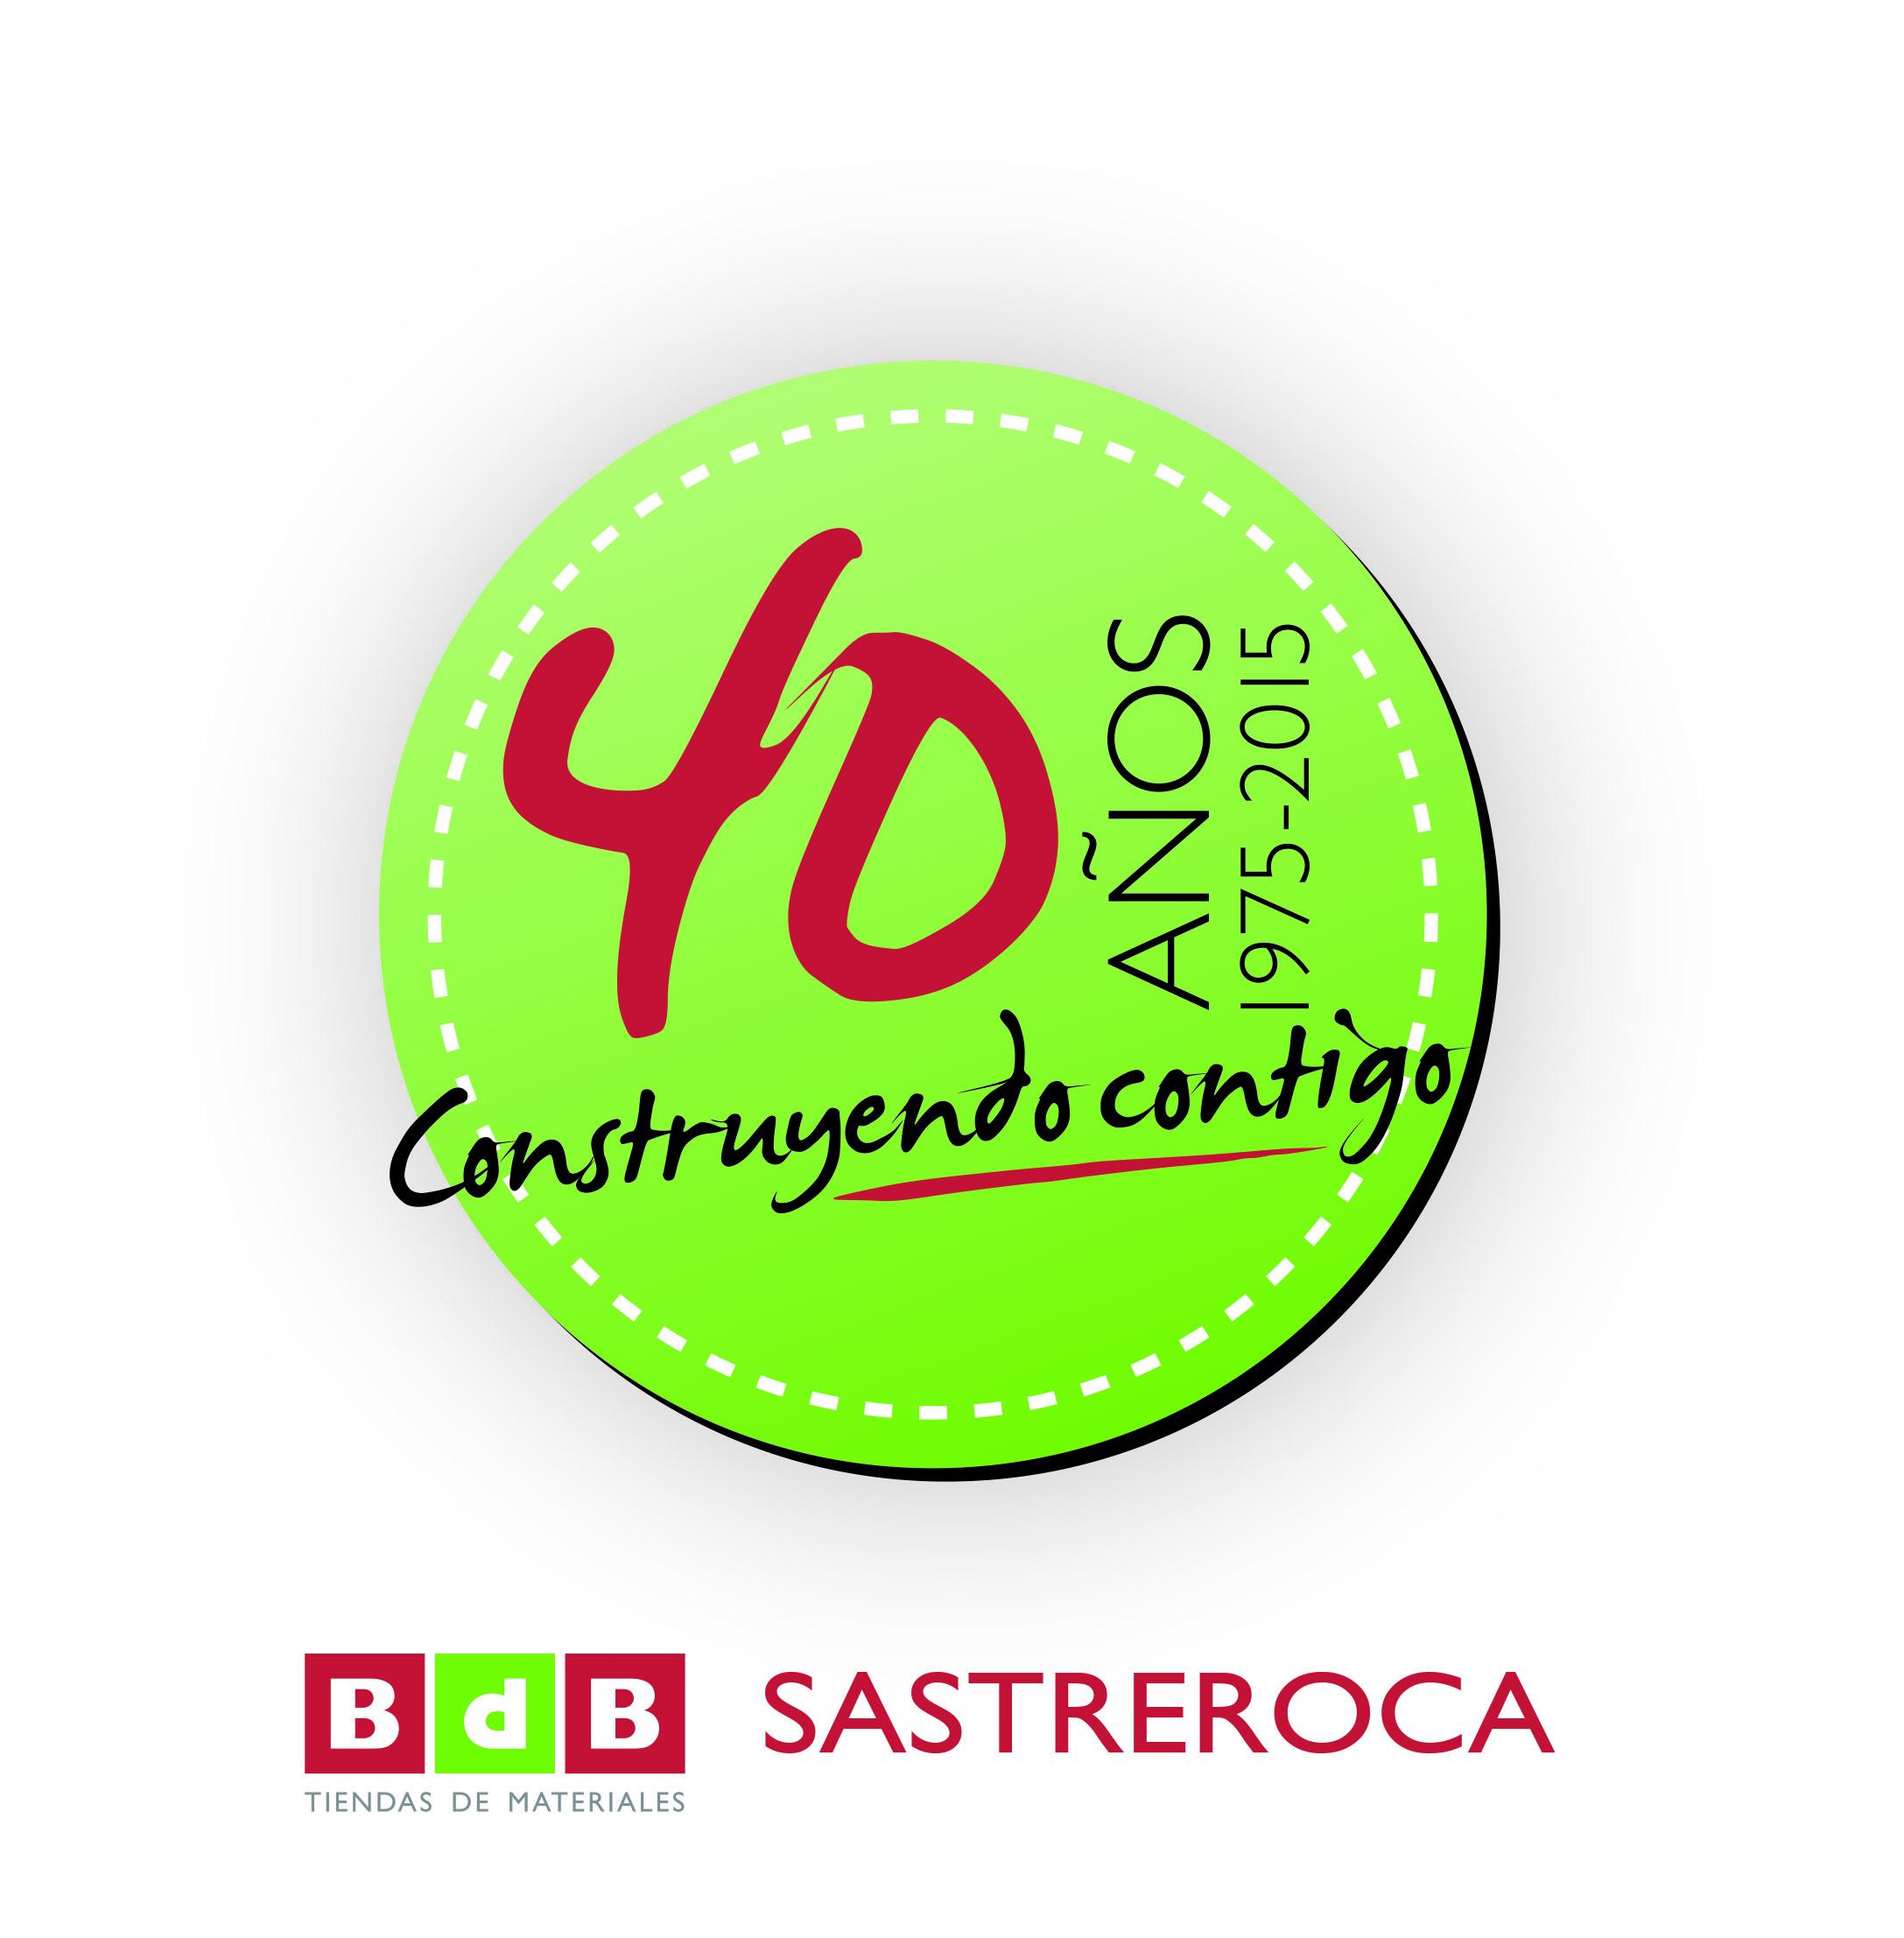 BdB SASTREROCA